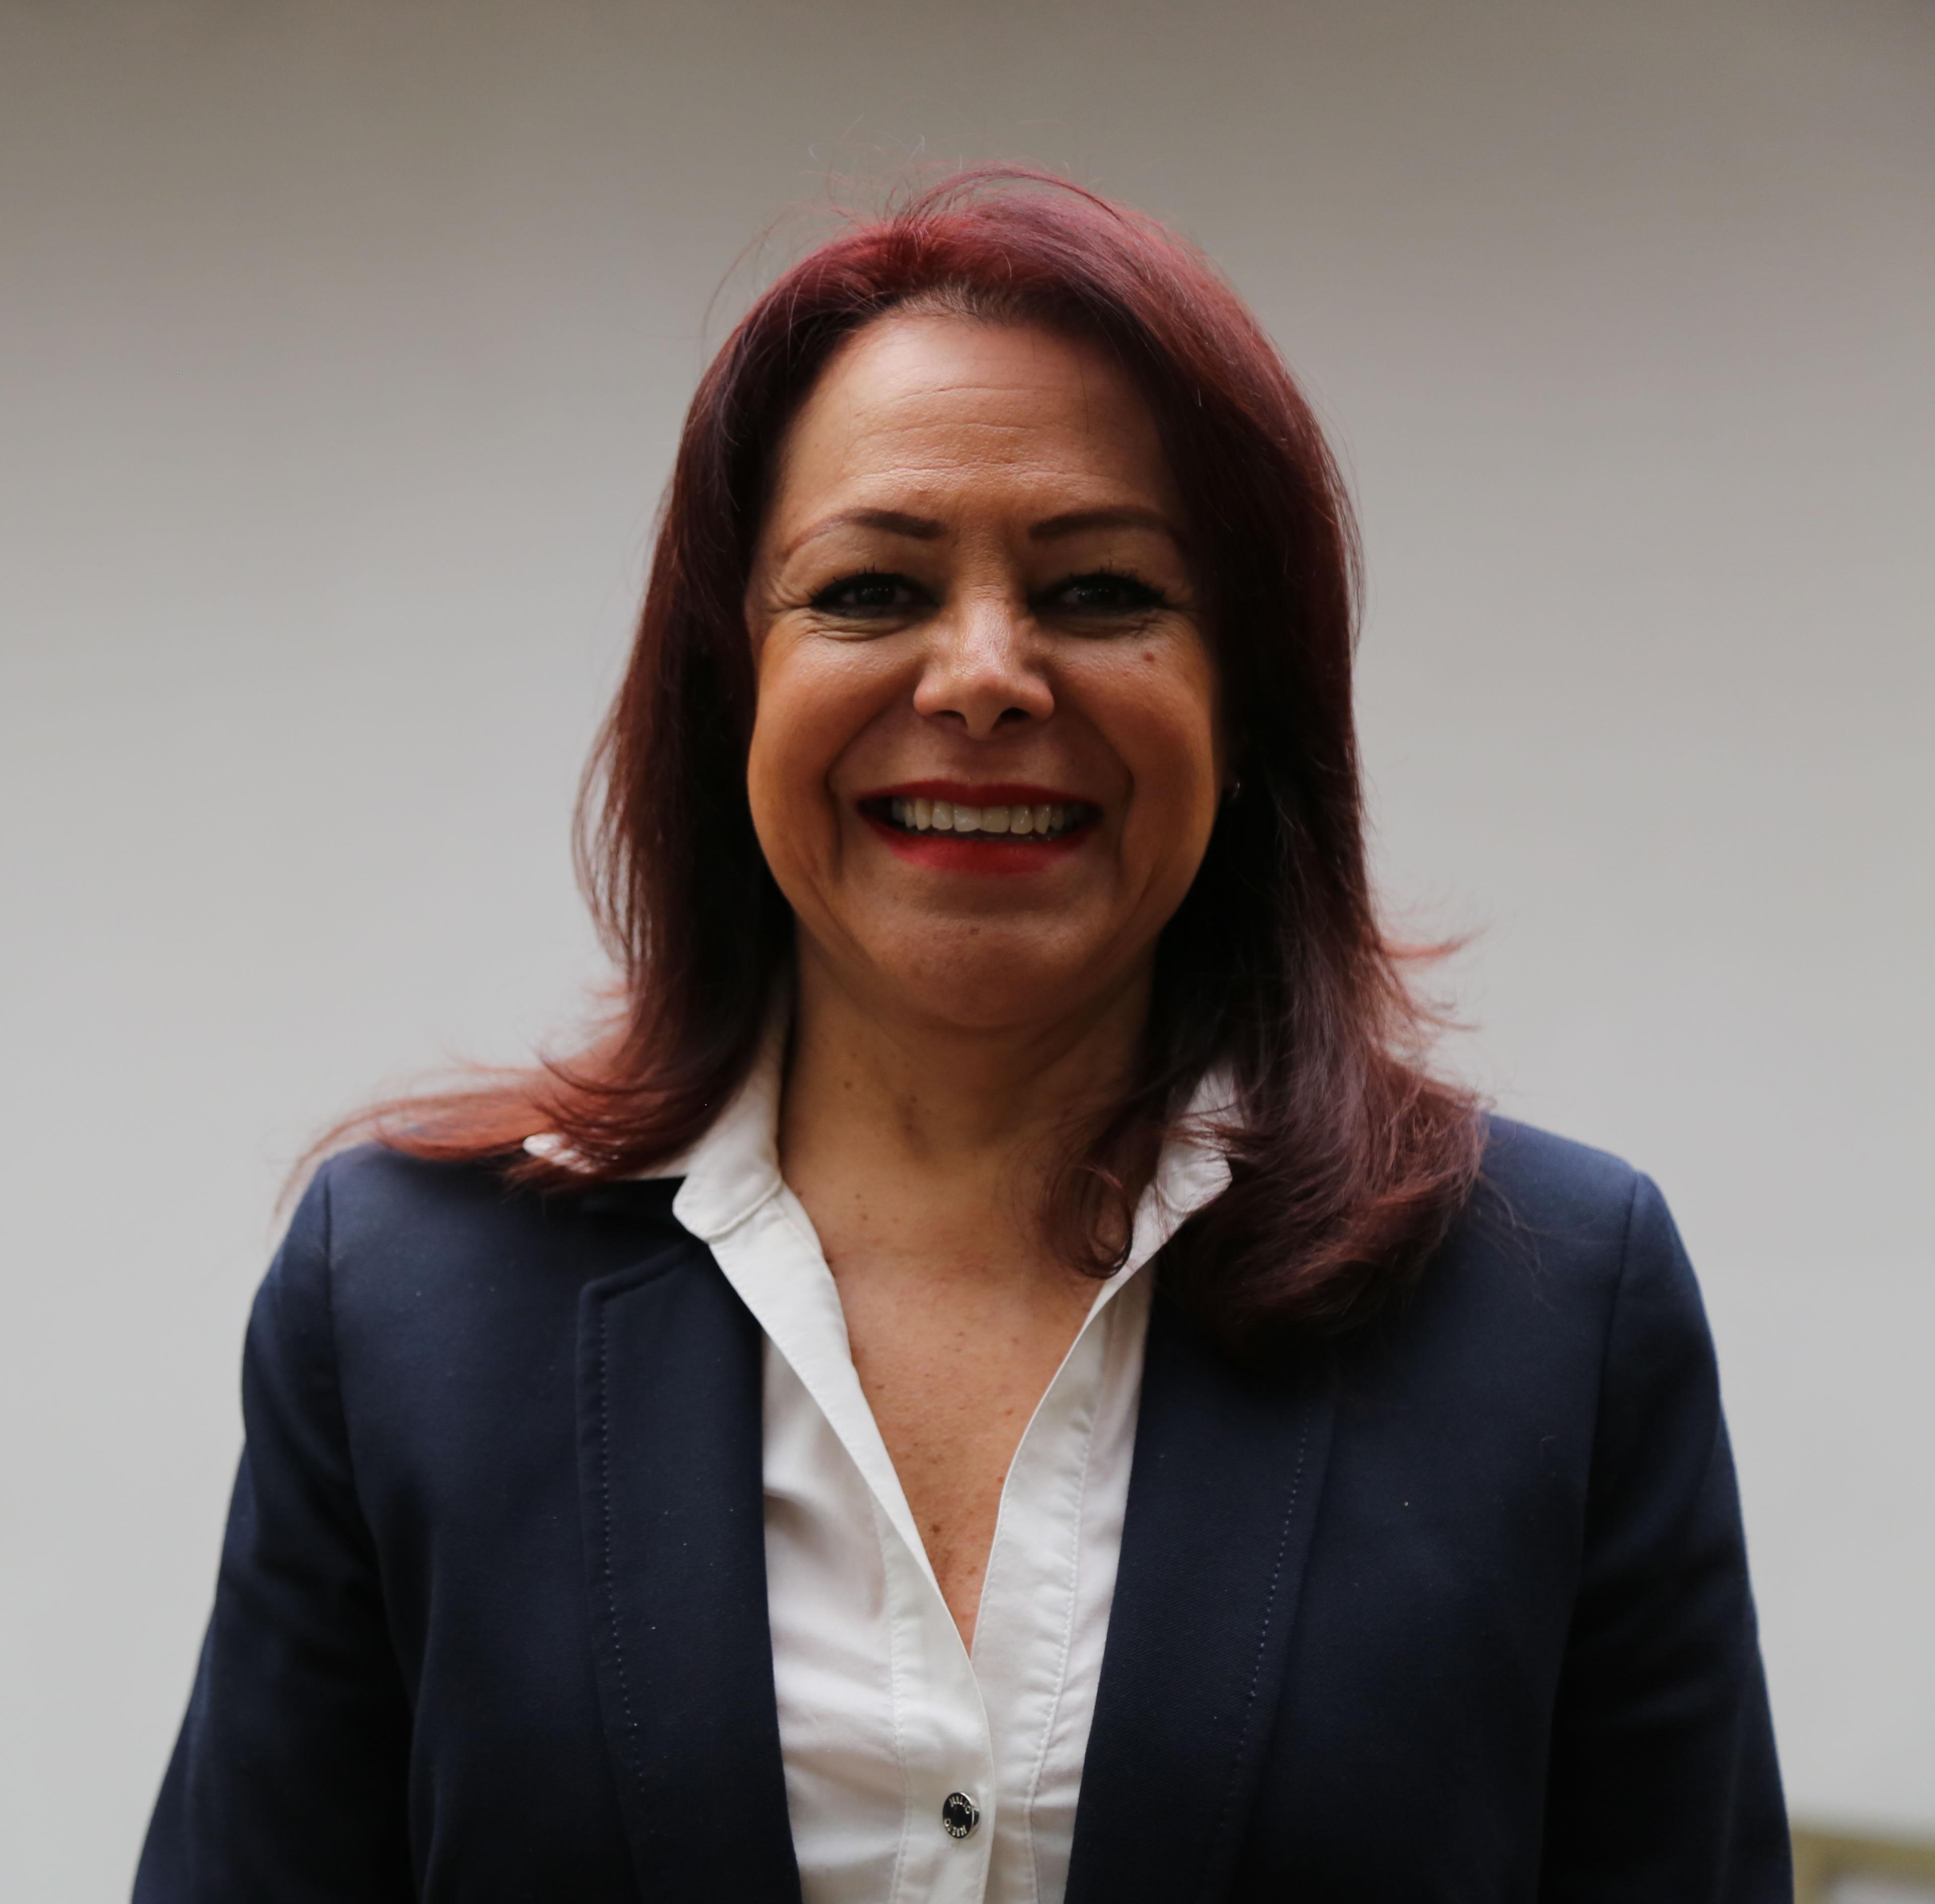 Karla Guillermina Fernández Saavedra